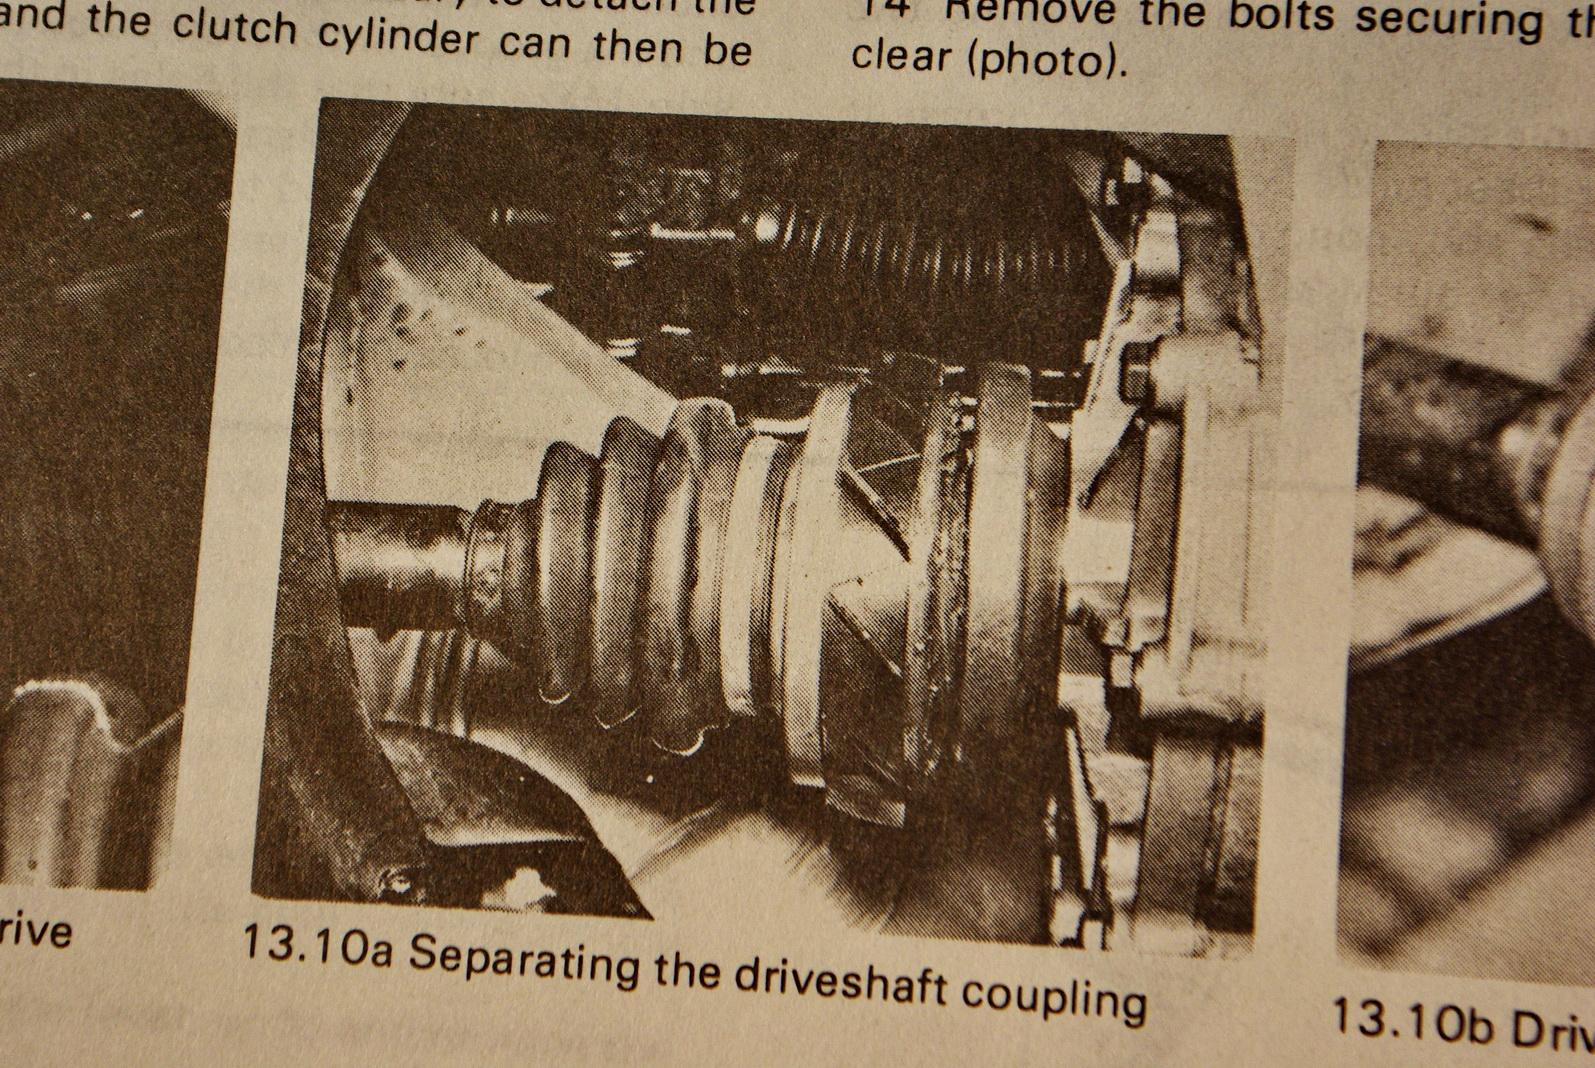 CV joint deflector